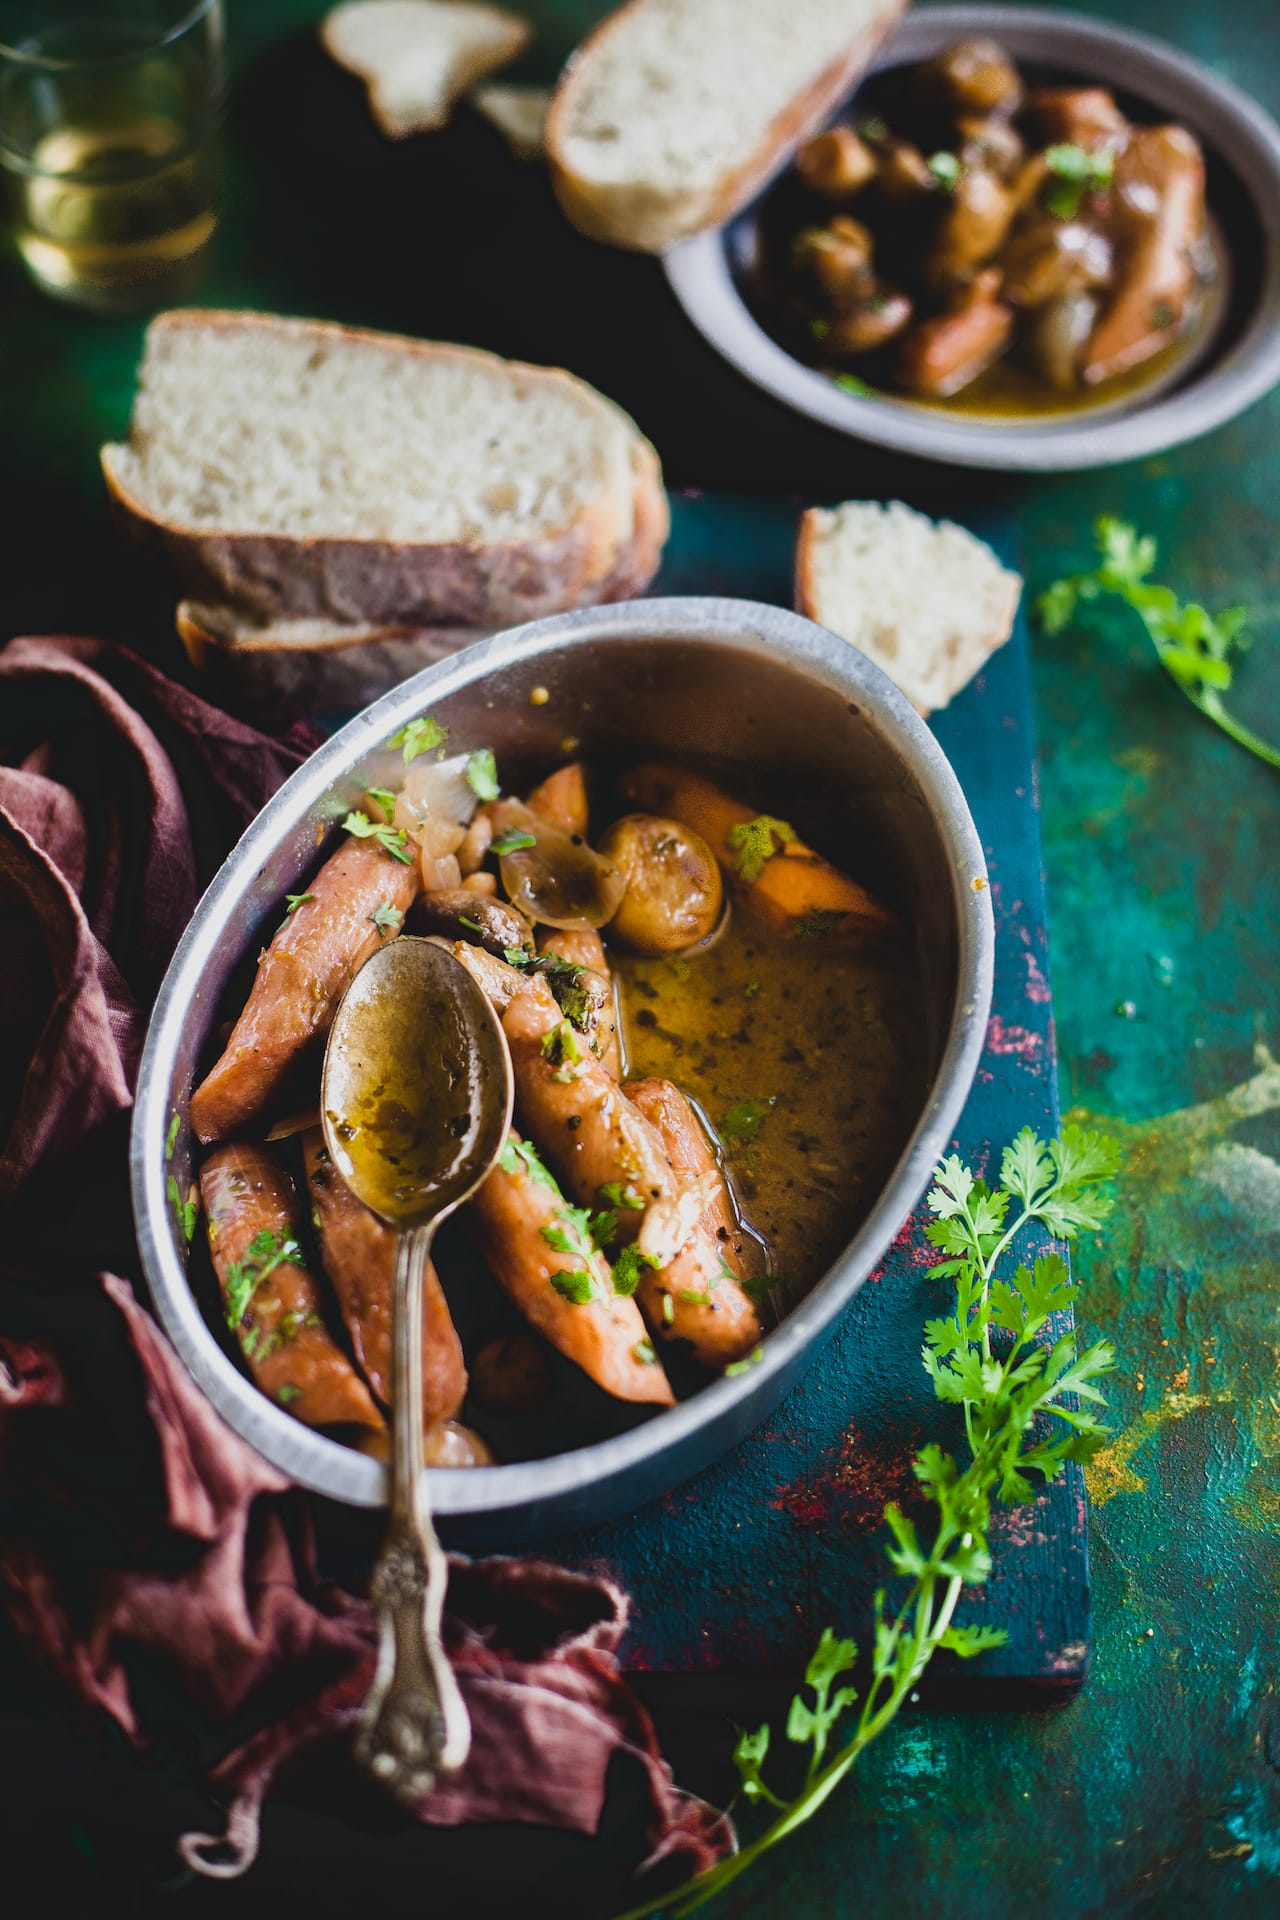 Mushroom And Sausage In Garlic Wine Sauce | Playful Cooking